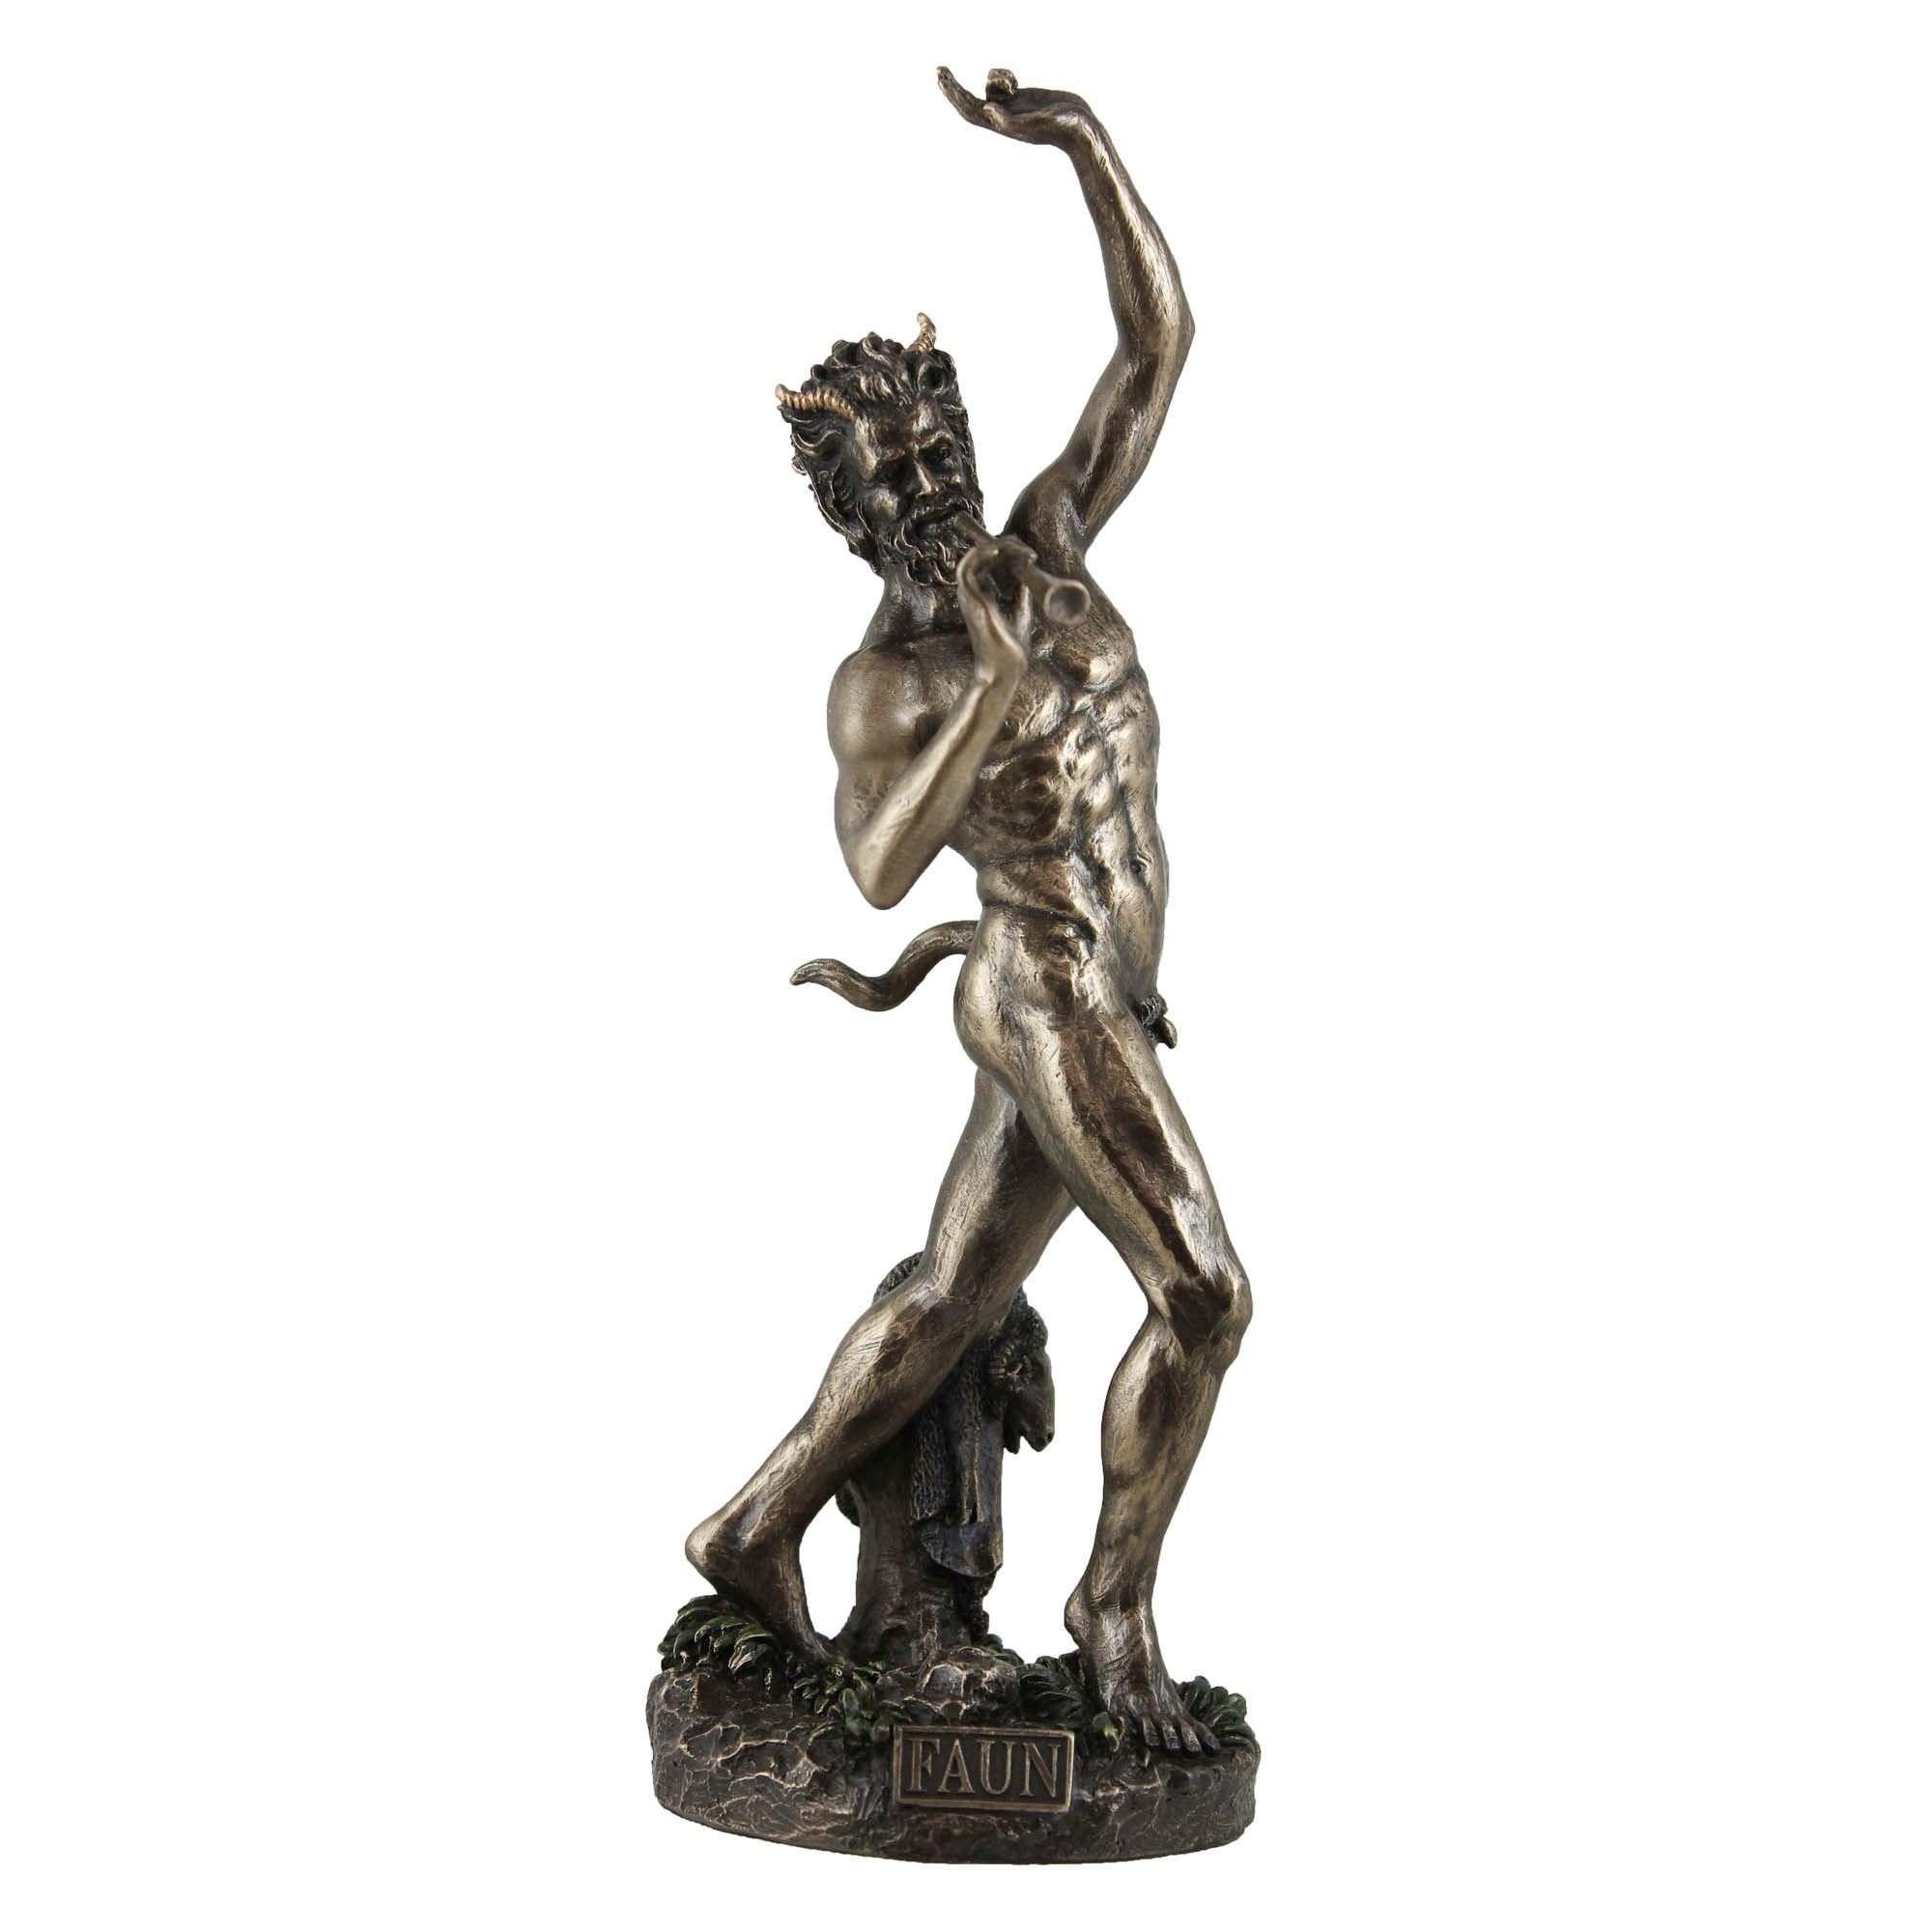 Veronese Cold Cast Bronze Coated Roman Mythology Figurine, Faun